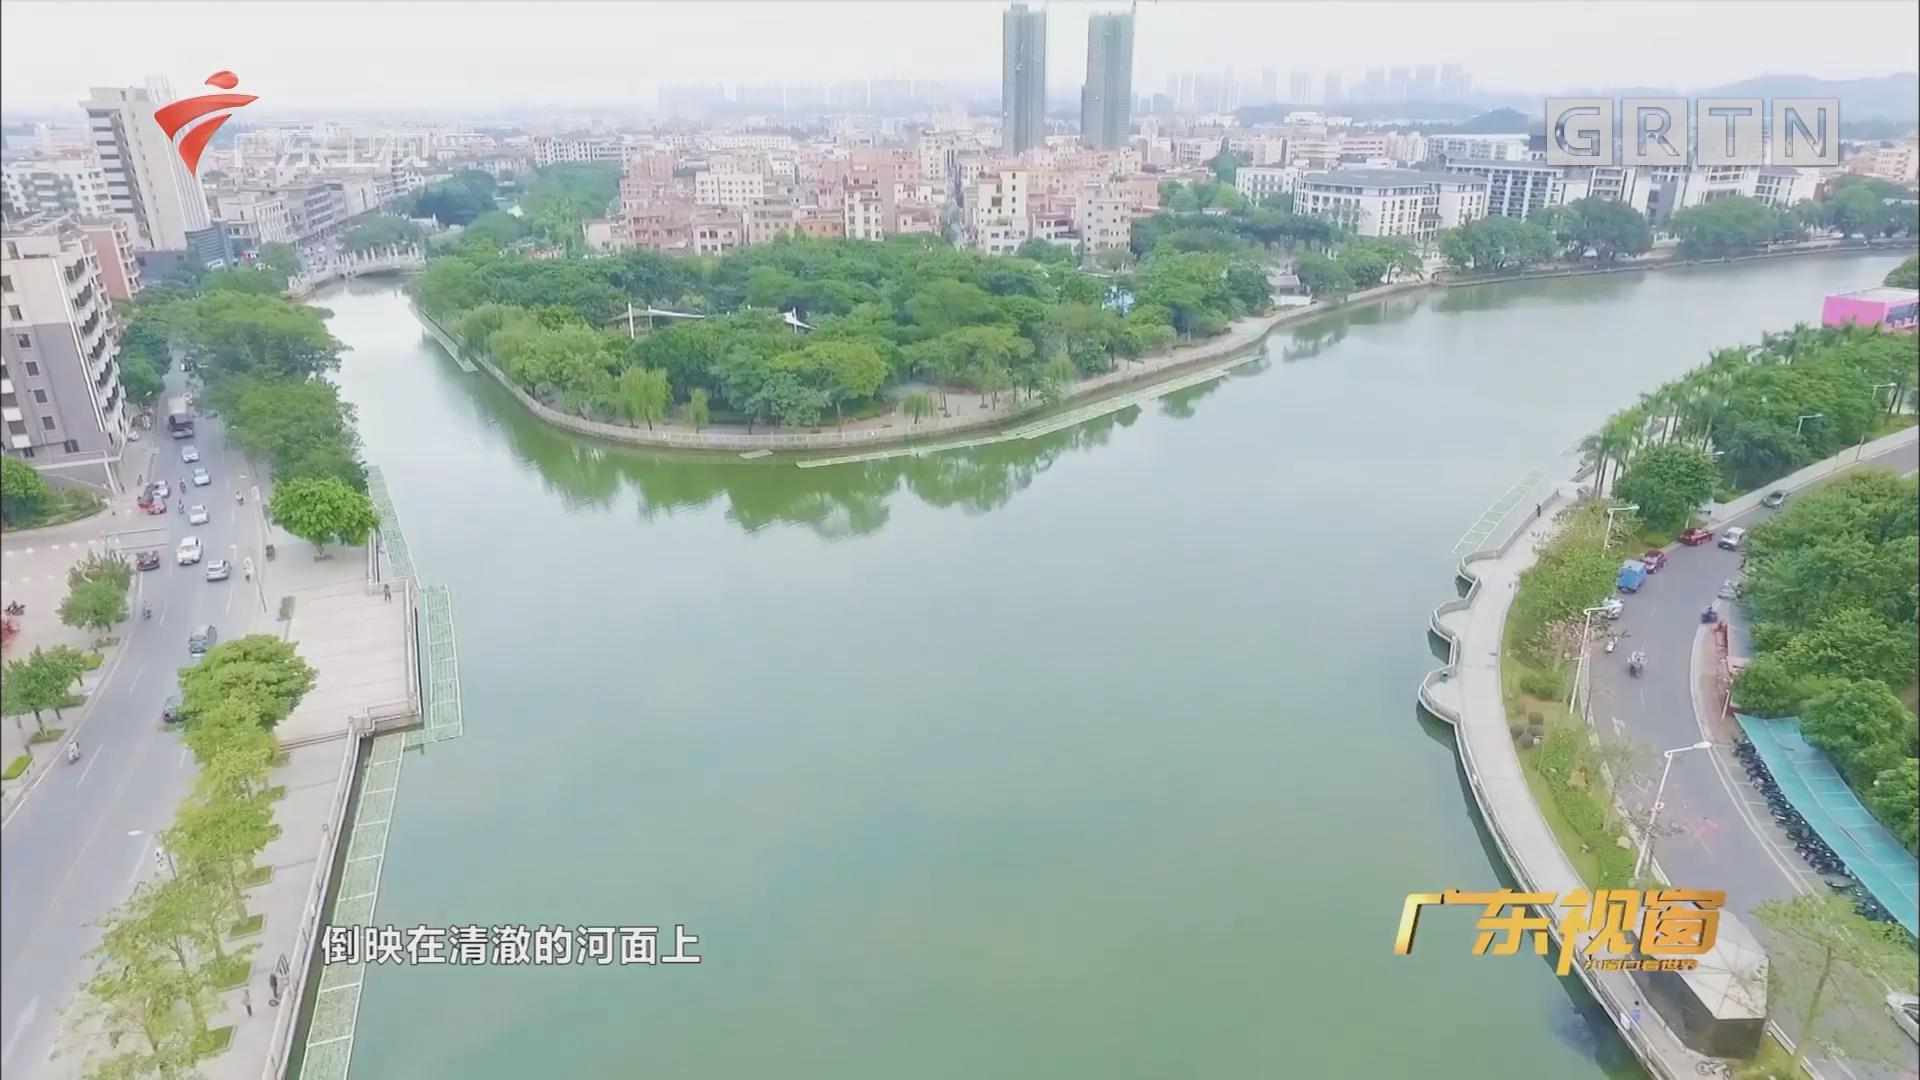 [HD][2018-11-24]广东视窗:佛山:河长制让曾经的臭河涌蝶变成4A级景区